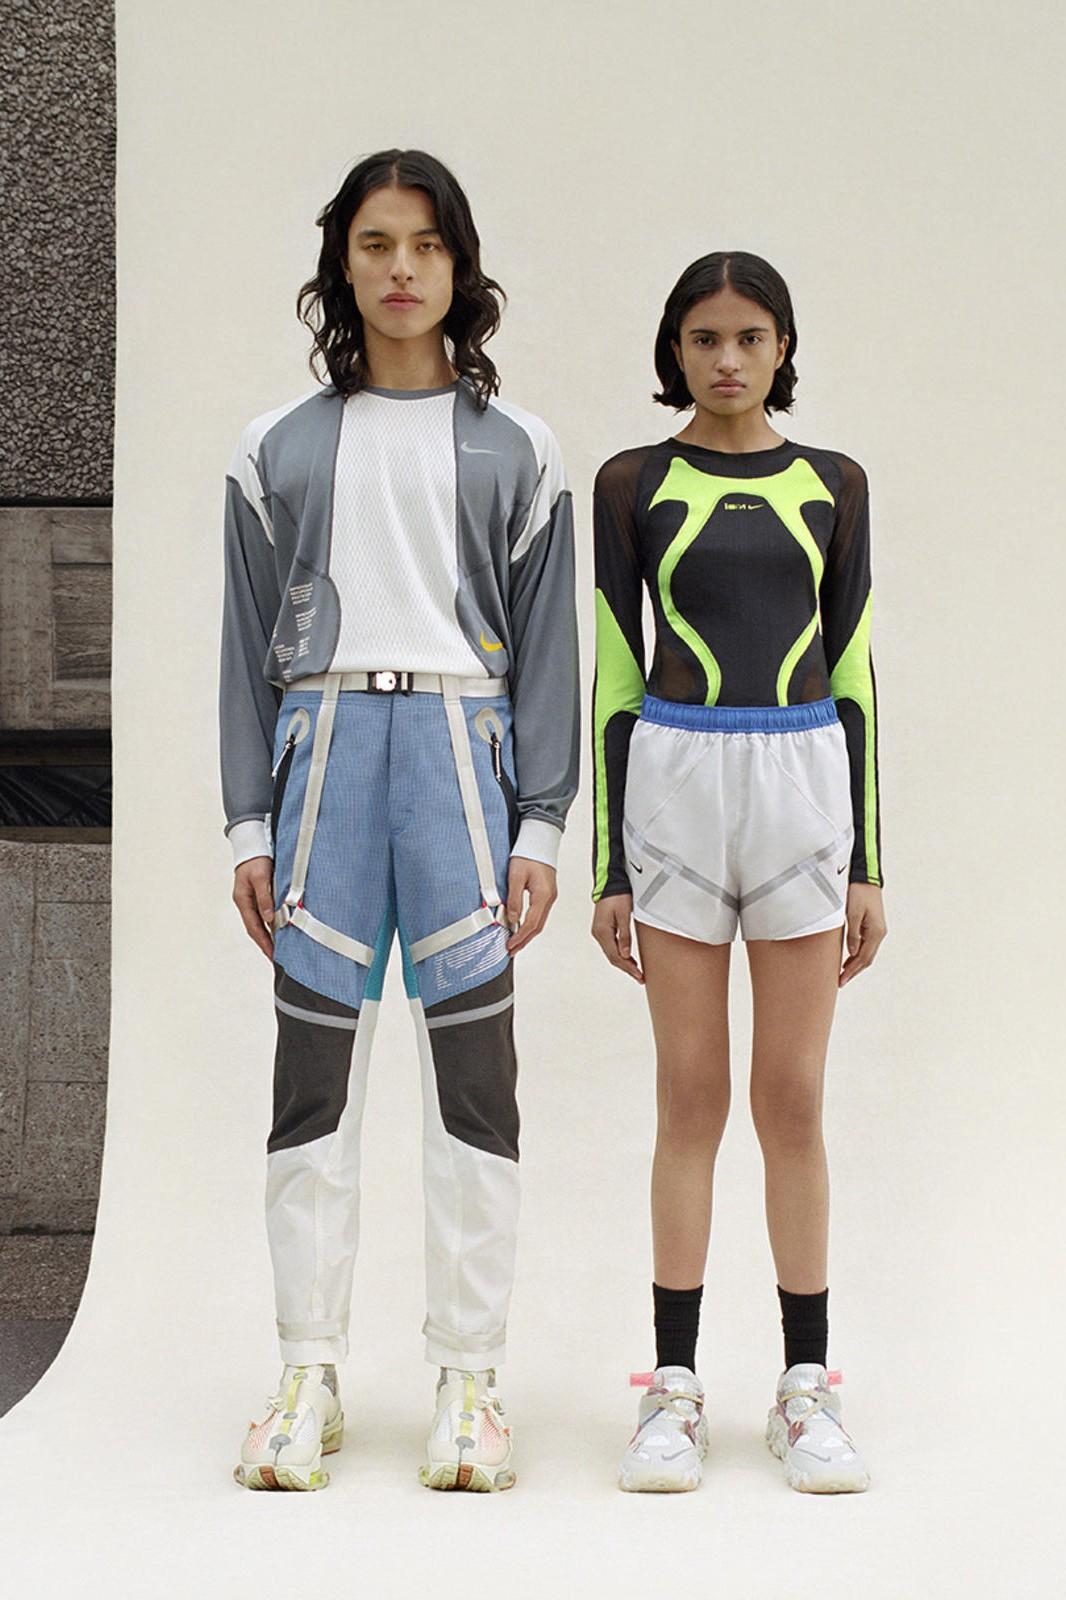 nike-ispa-clothes-dtf-magazine-20